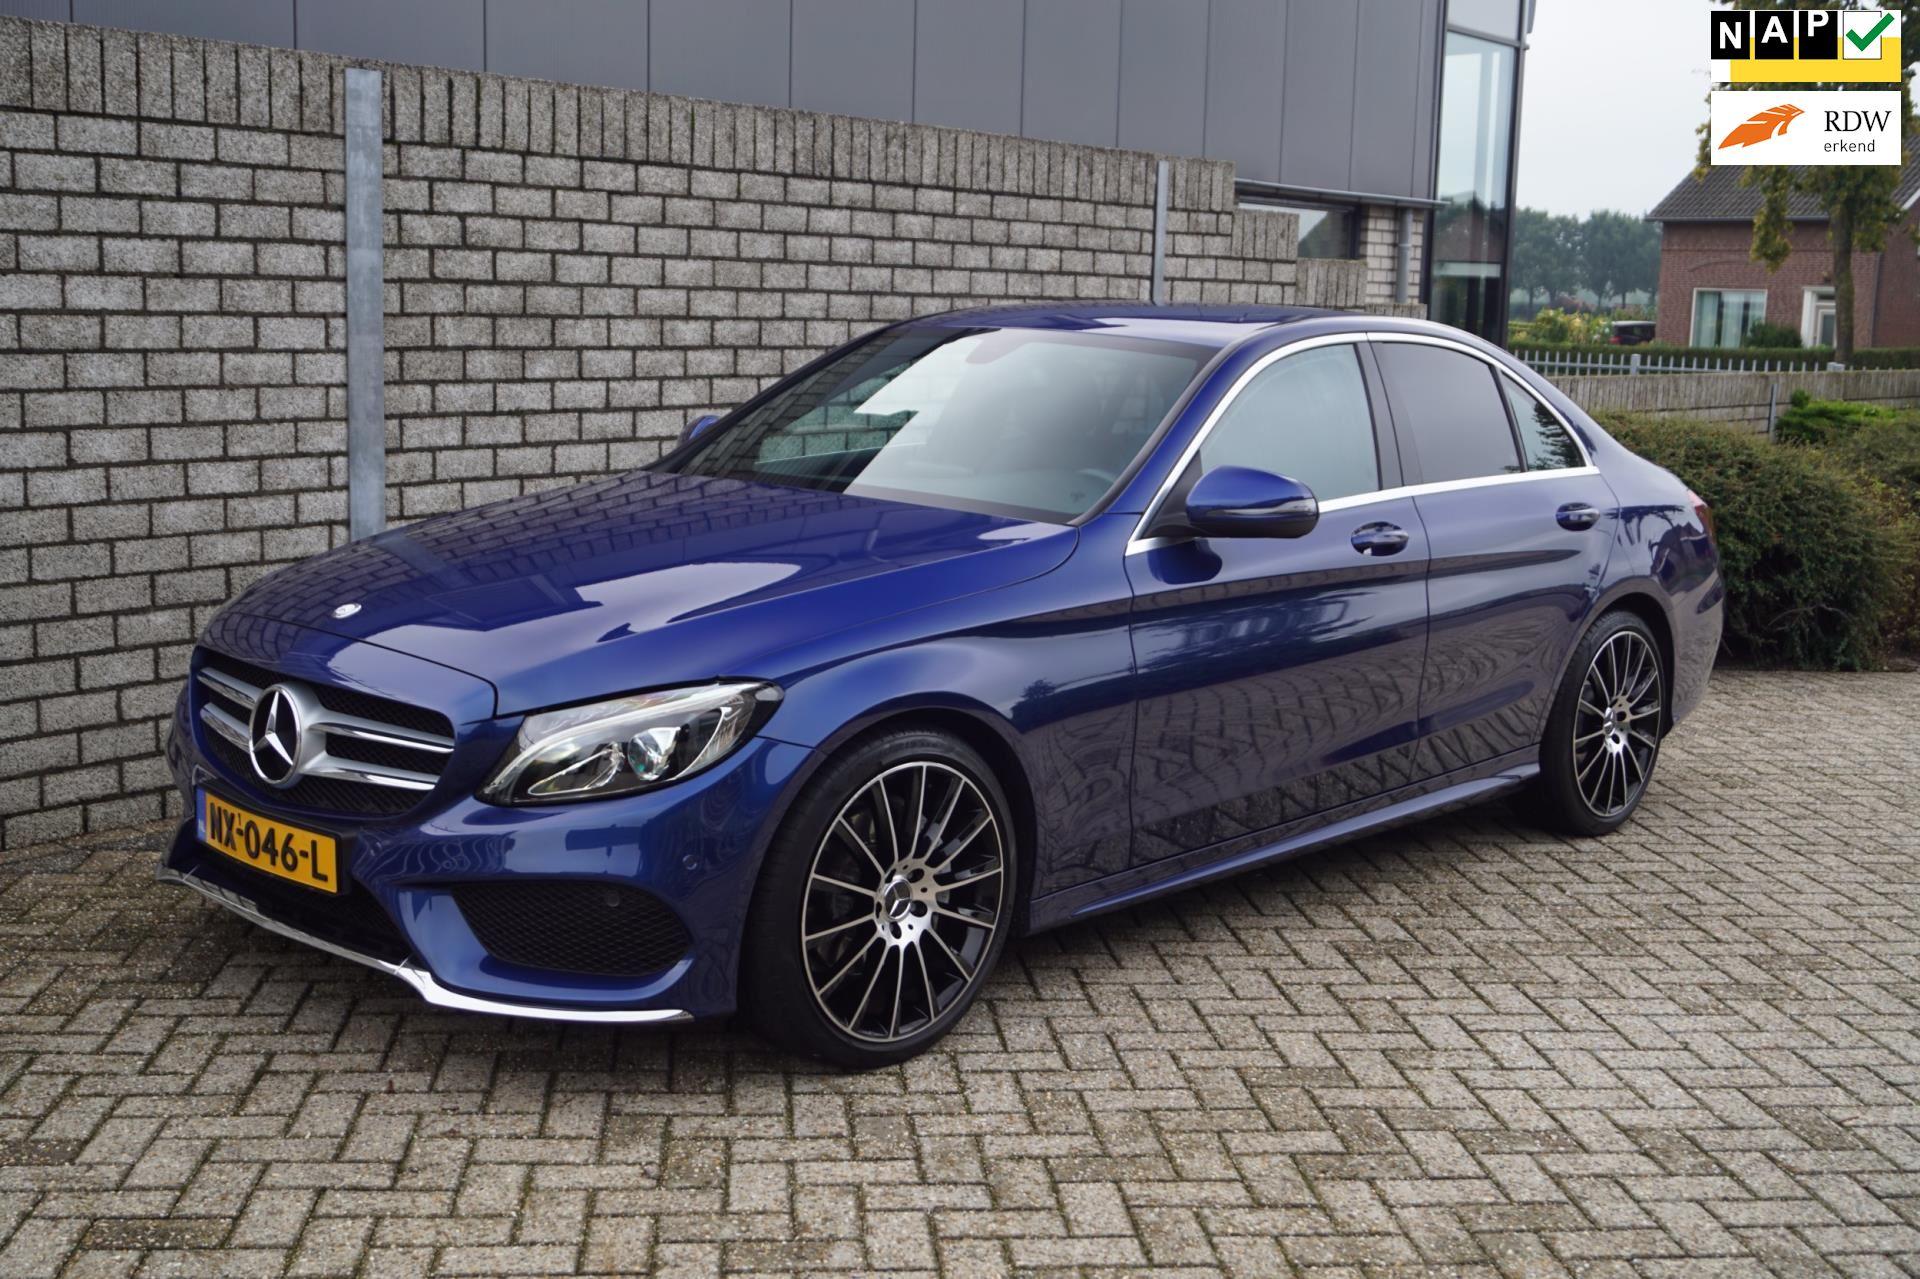 Mercedes-Benz C-klasse occasion - Autobedrijf H. Wijdeven V.o.f.